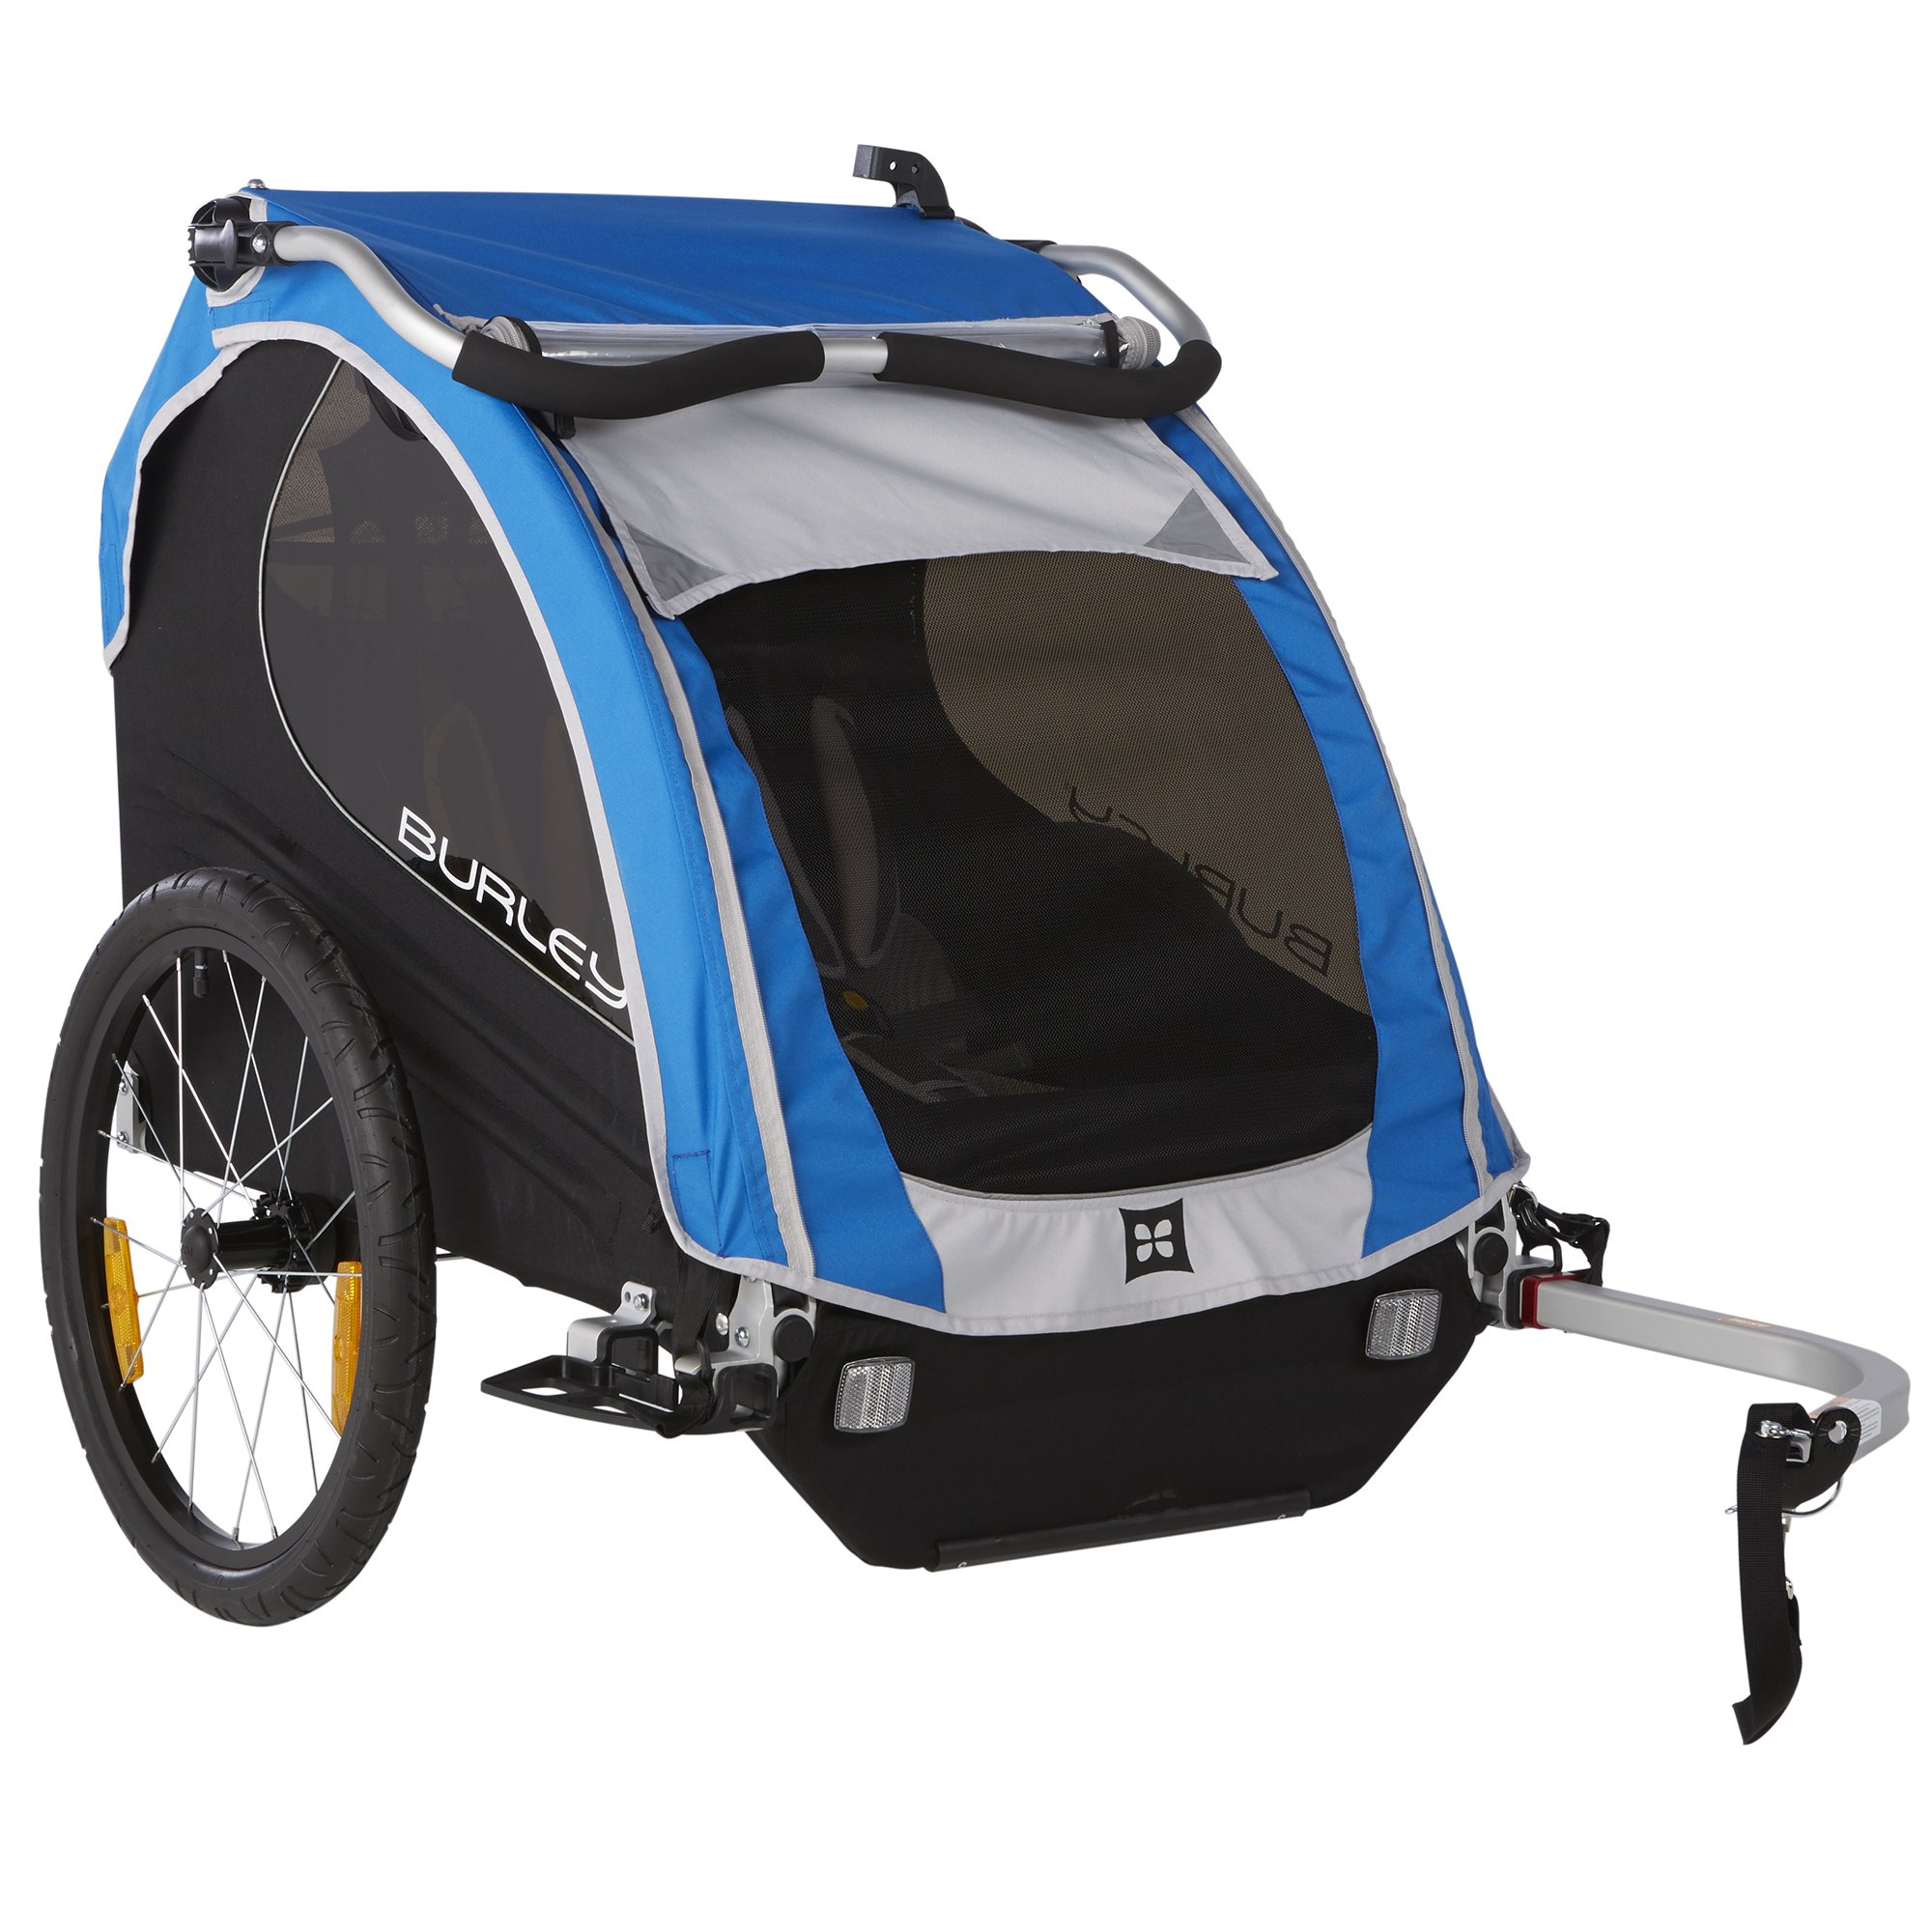 Burley Design Encore Child Bike Trailer, Blue